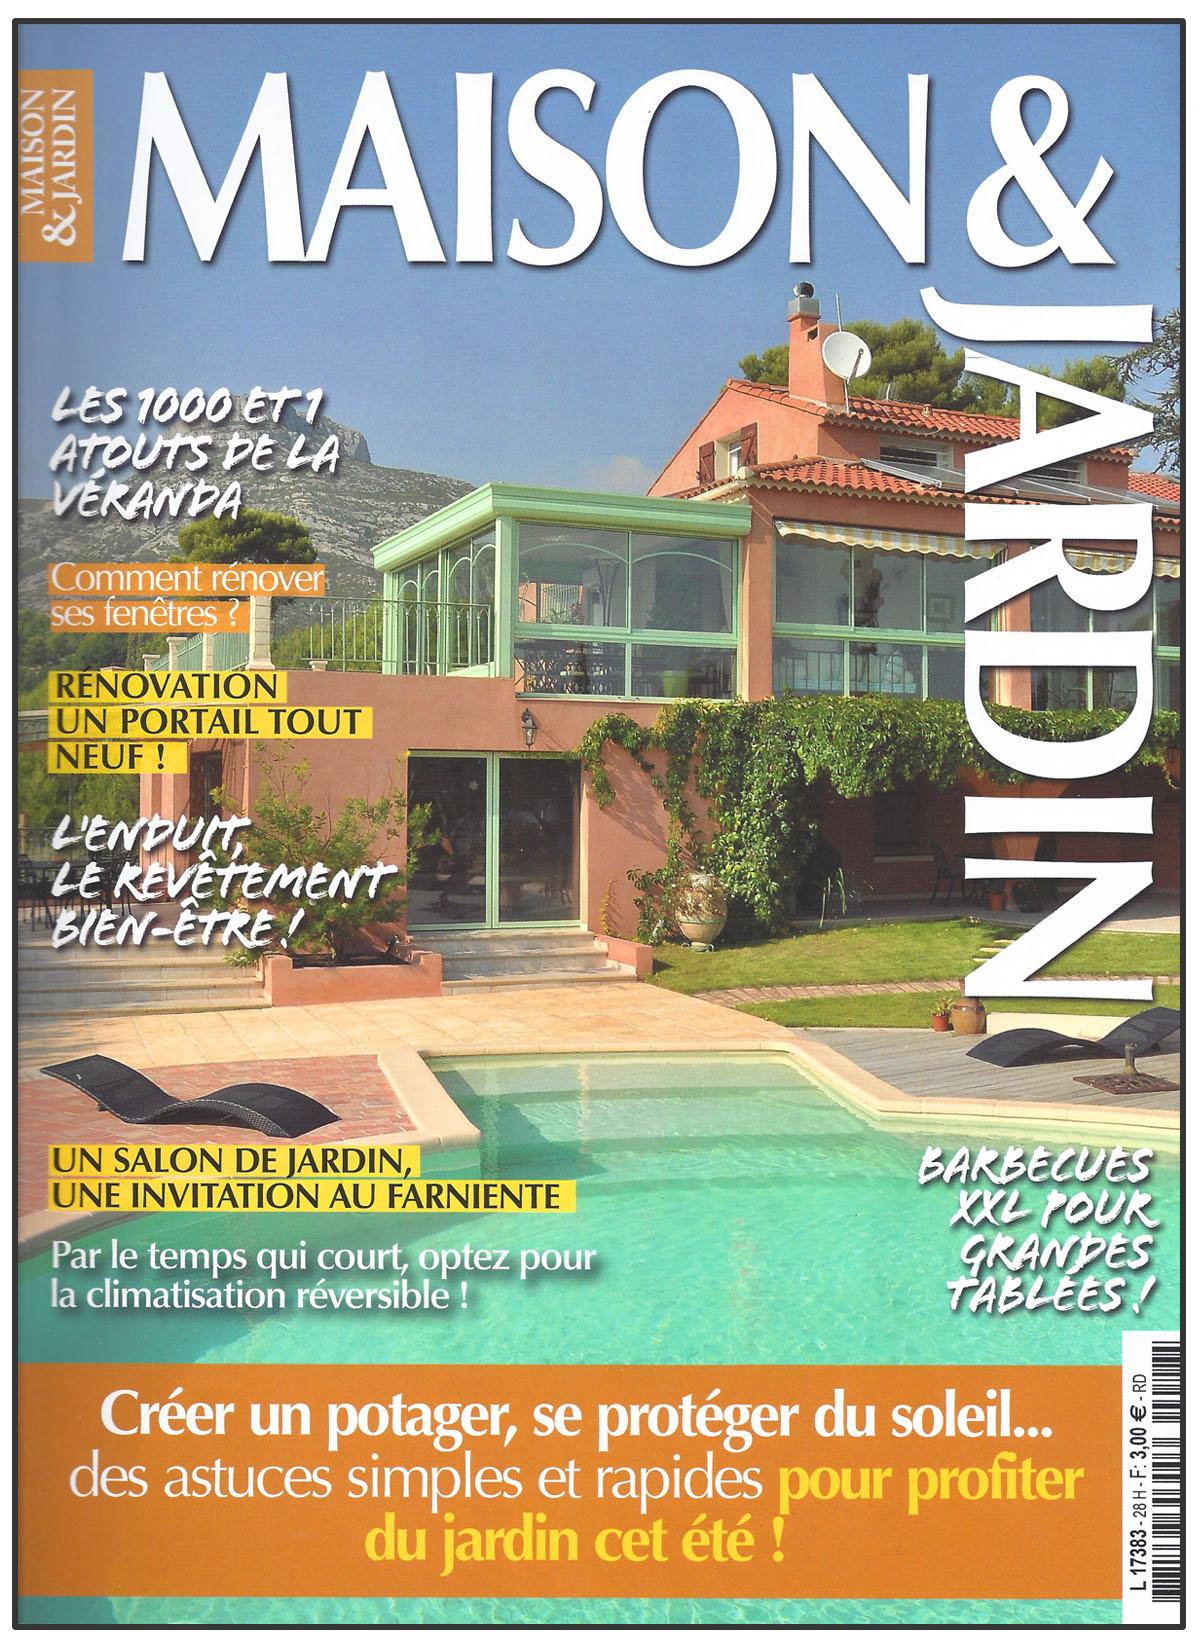 Couverture du magazine Maison&Jardin de mai/juin 2013